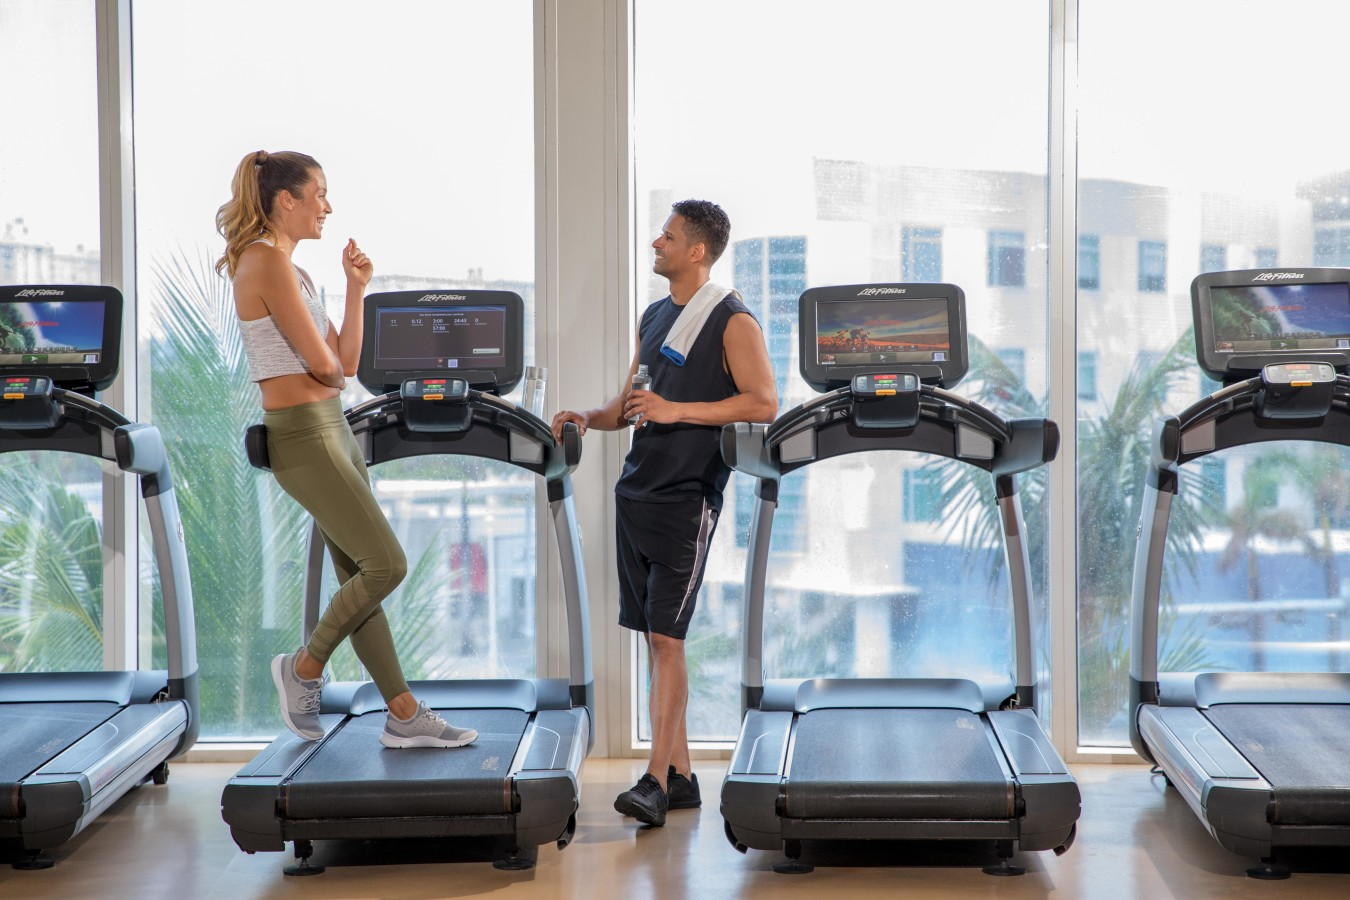 Fitness Center at Aquanox Spa